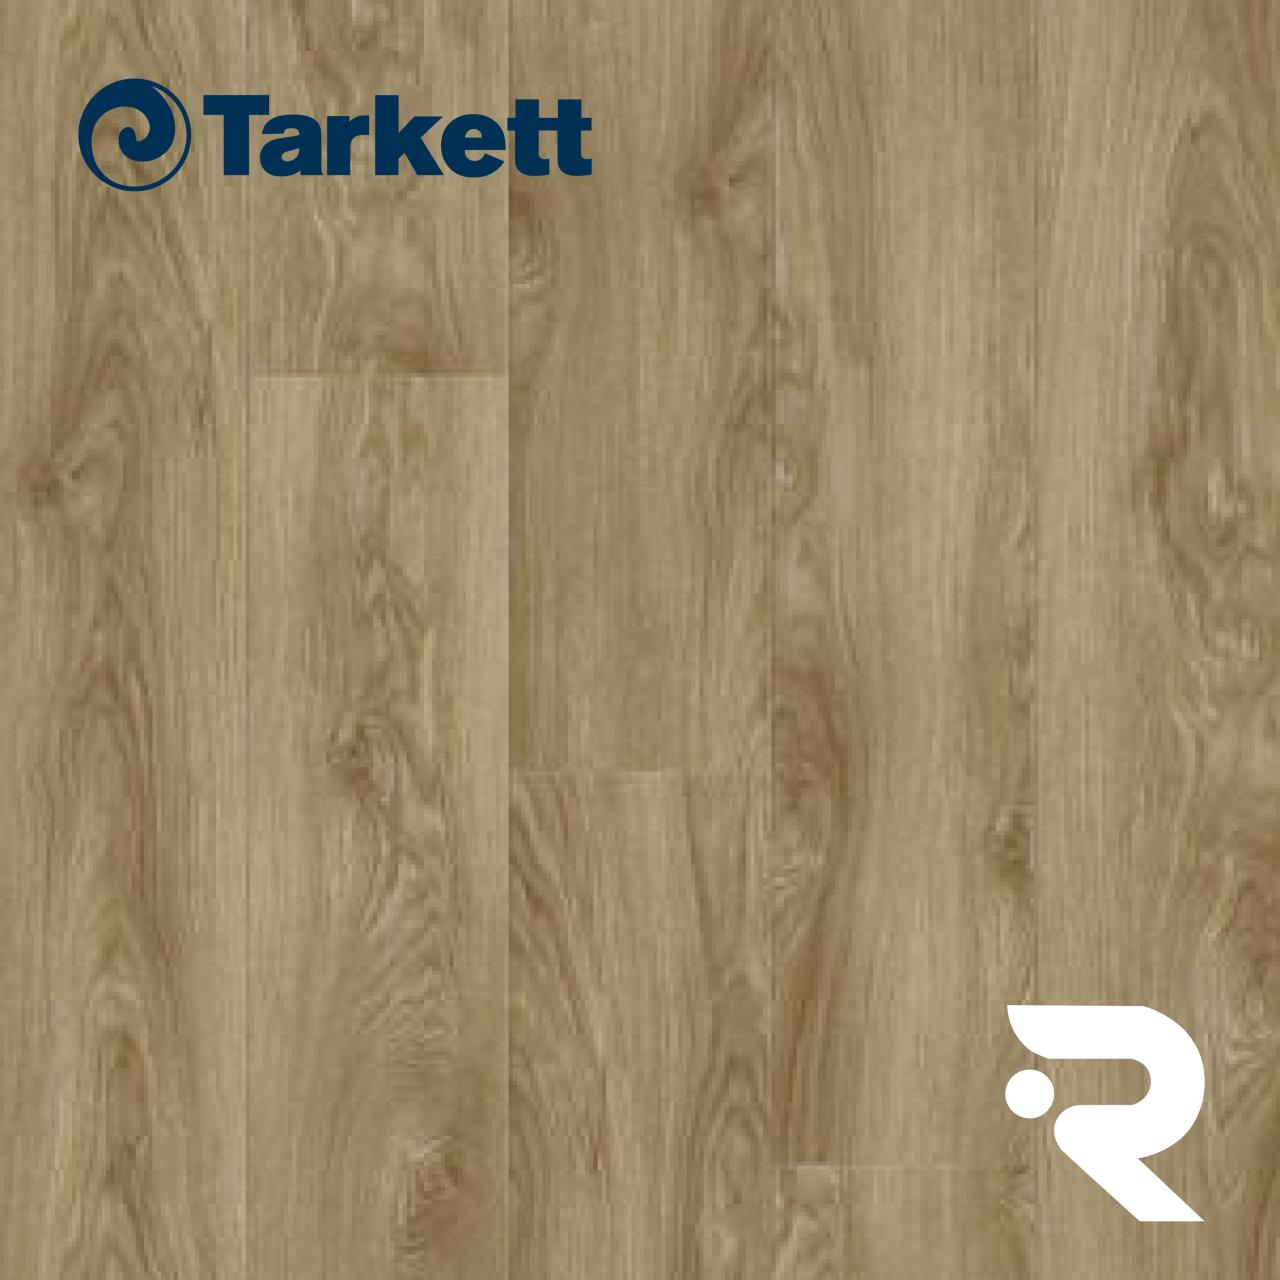 🌳 ПВХ плитка Tarkett | ModularT 7 - OAK ORIGIN LIGHT BROWN | Art Vinyl | 1200 x 200 мм